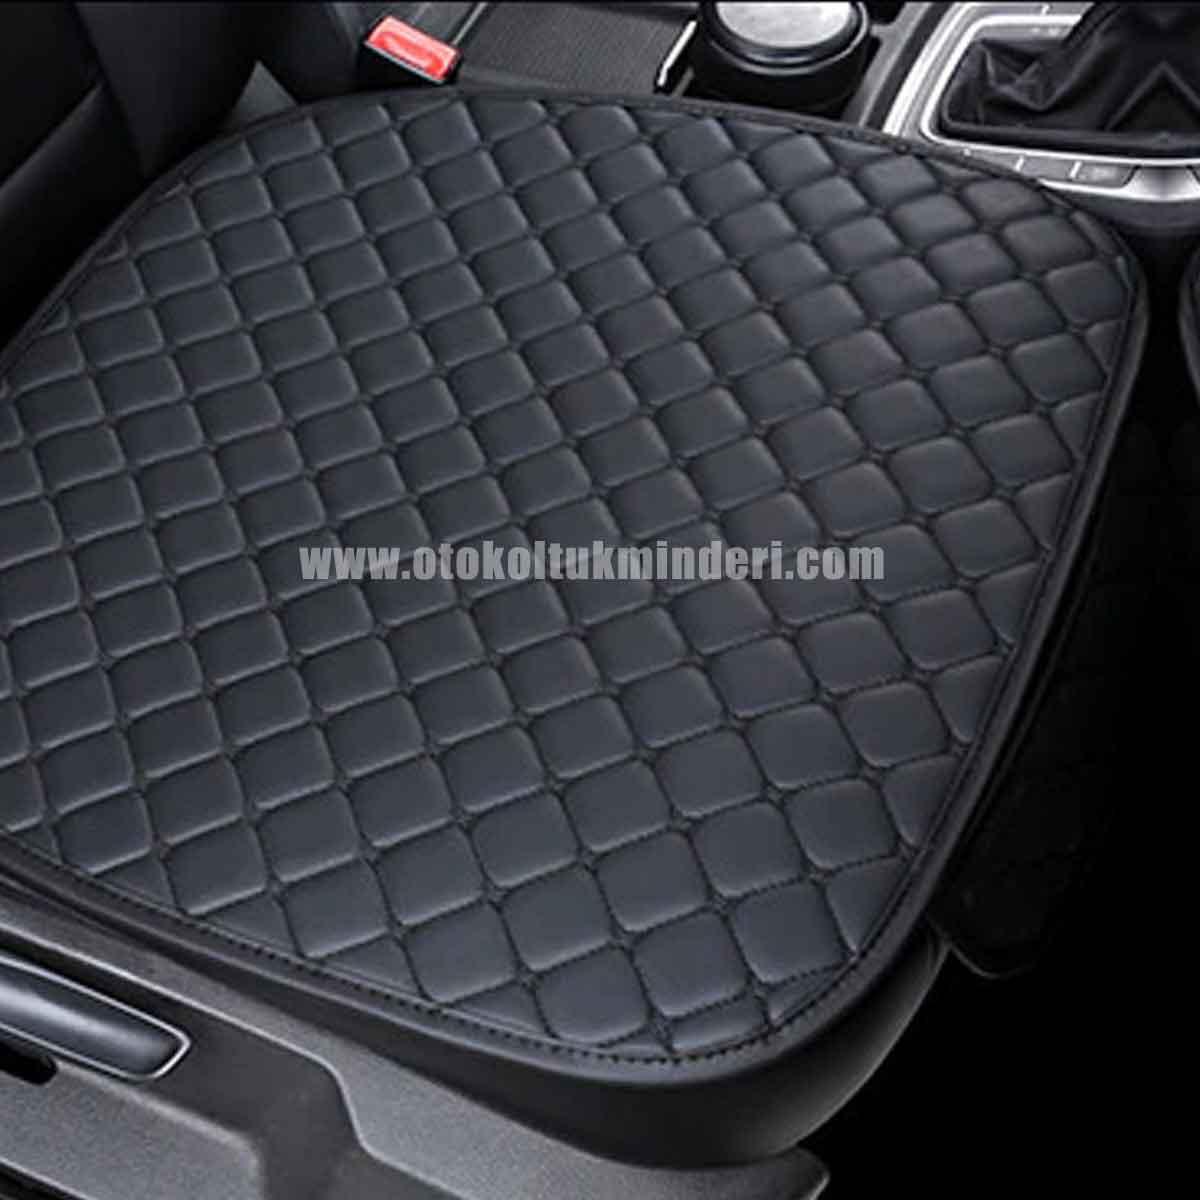 Opel oto koltuk kılıfı - Opel Koltuk minderi Siyah Deri Cepli